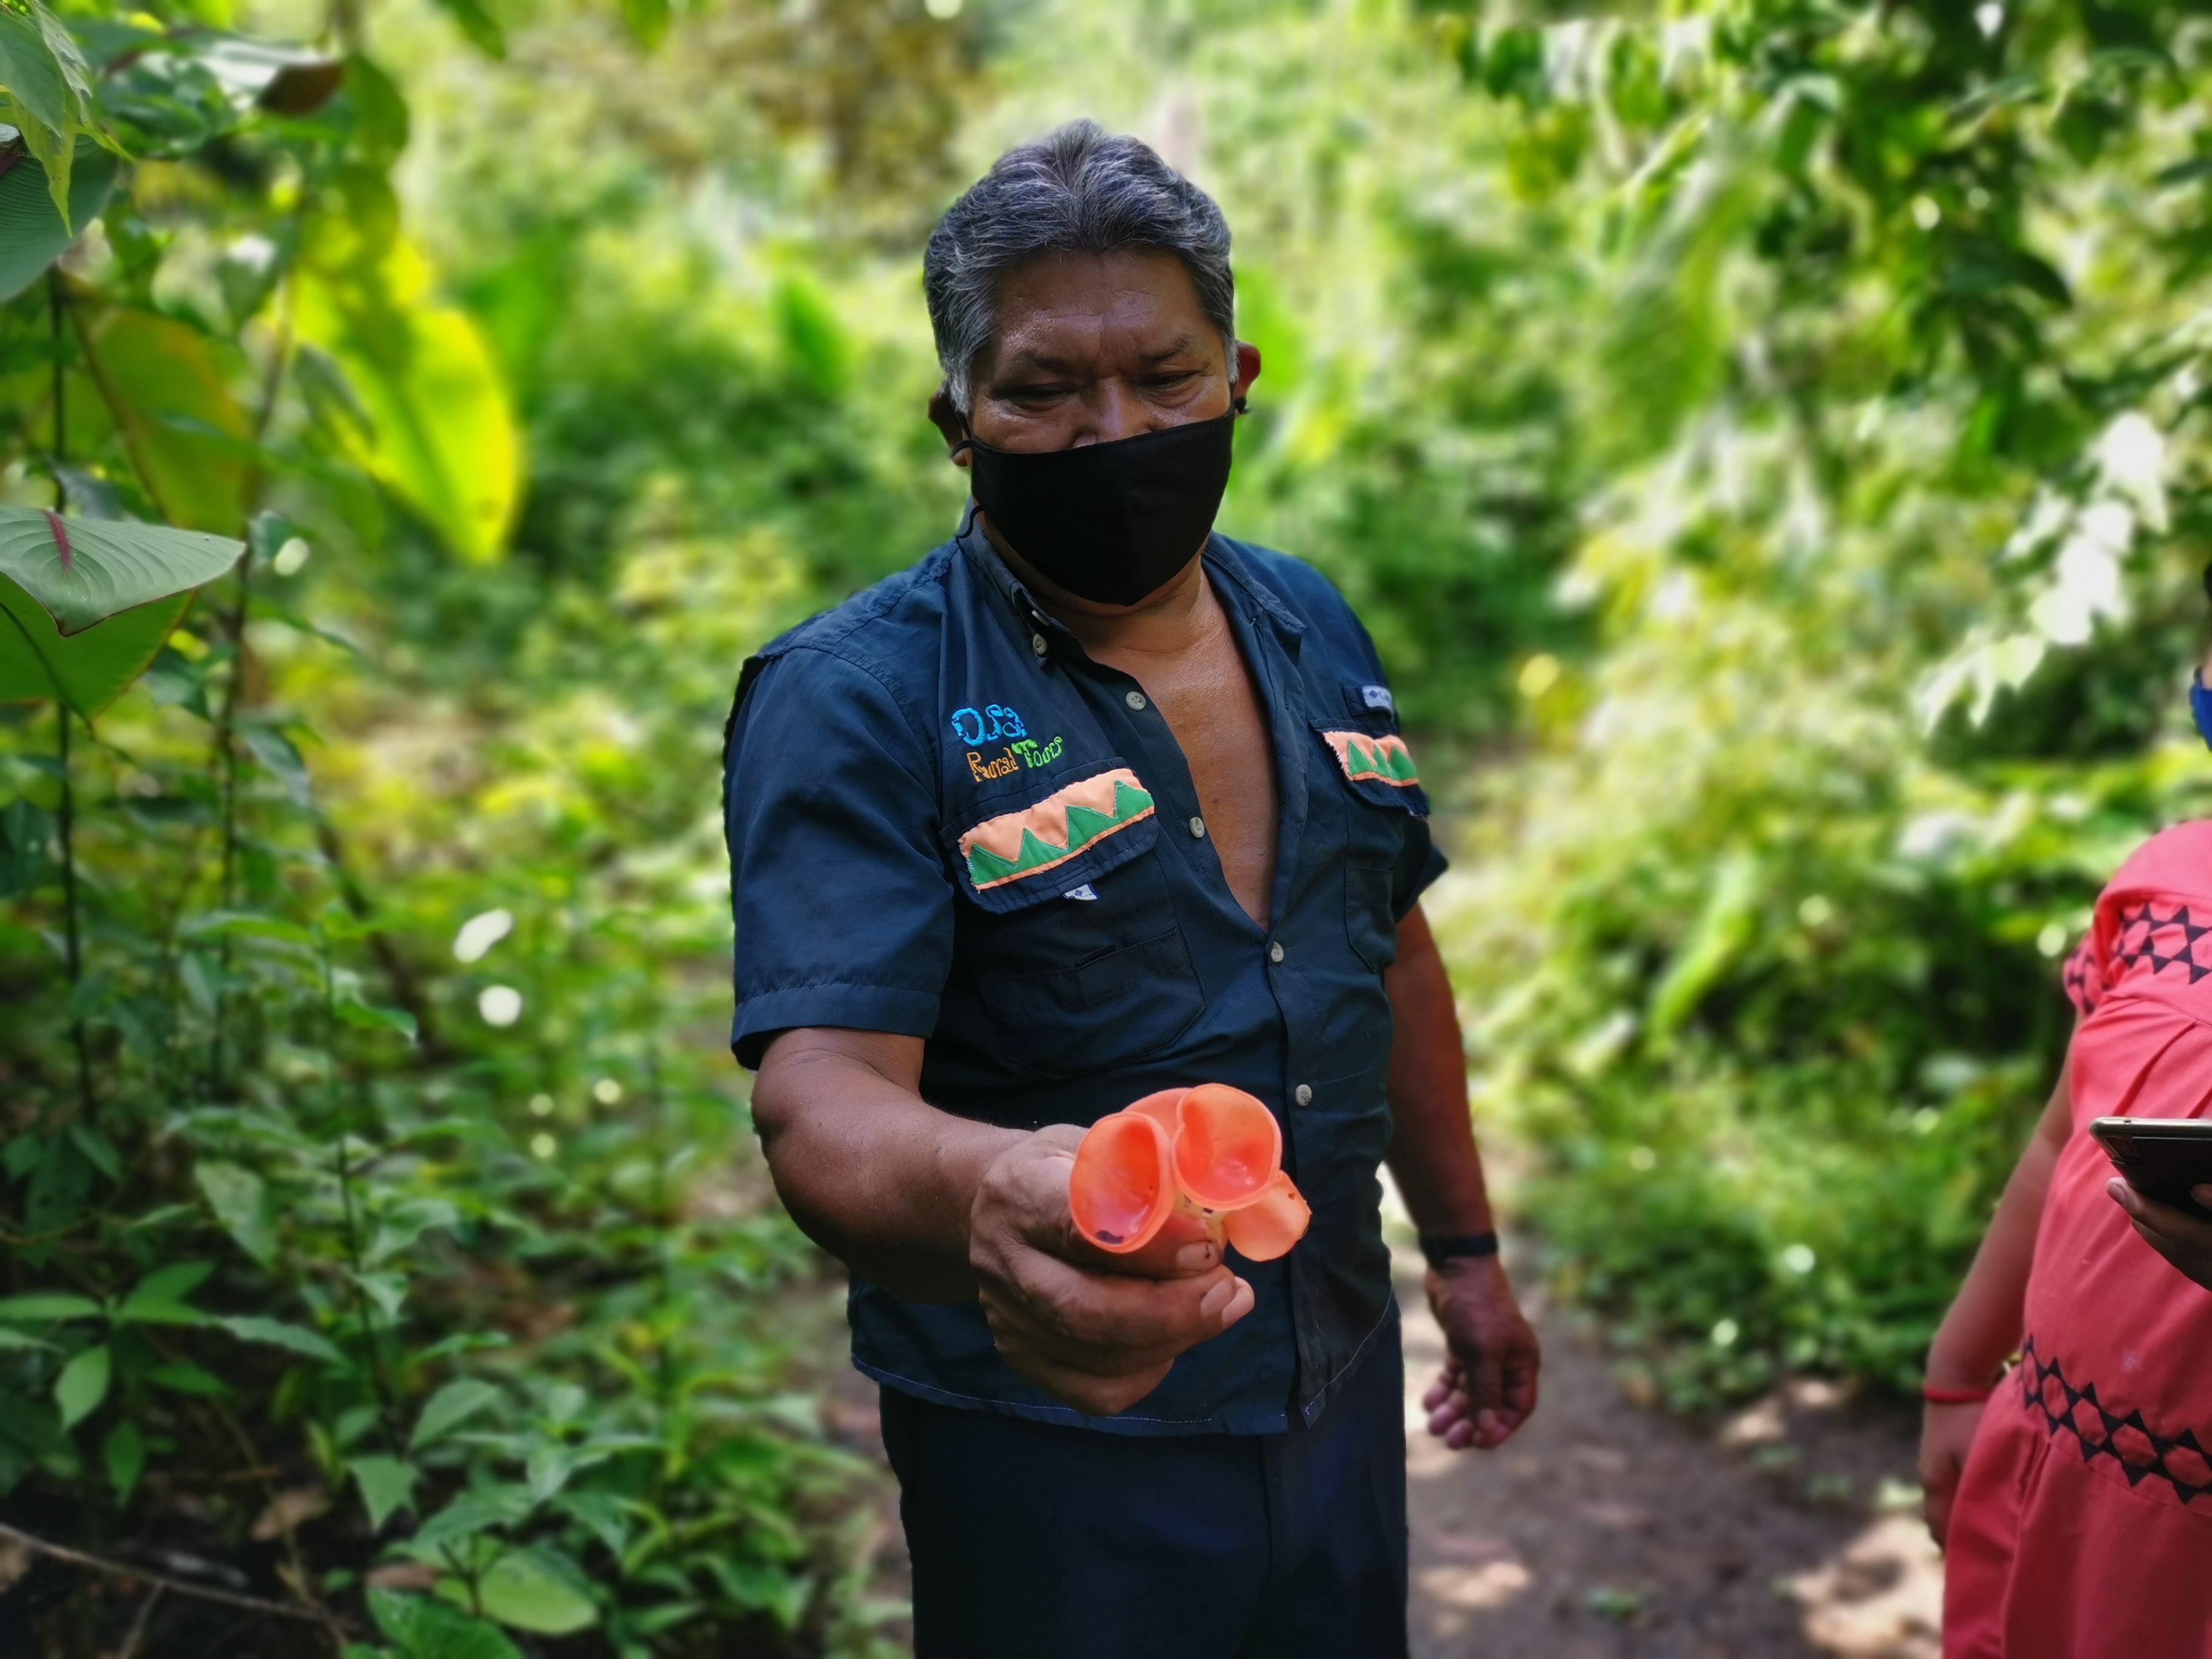 visite-famille-ngobe-voyage-costa-rica-champignons